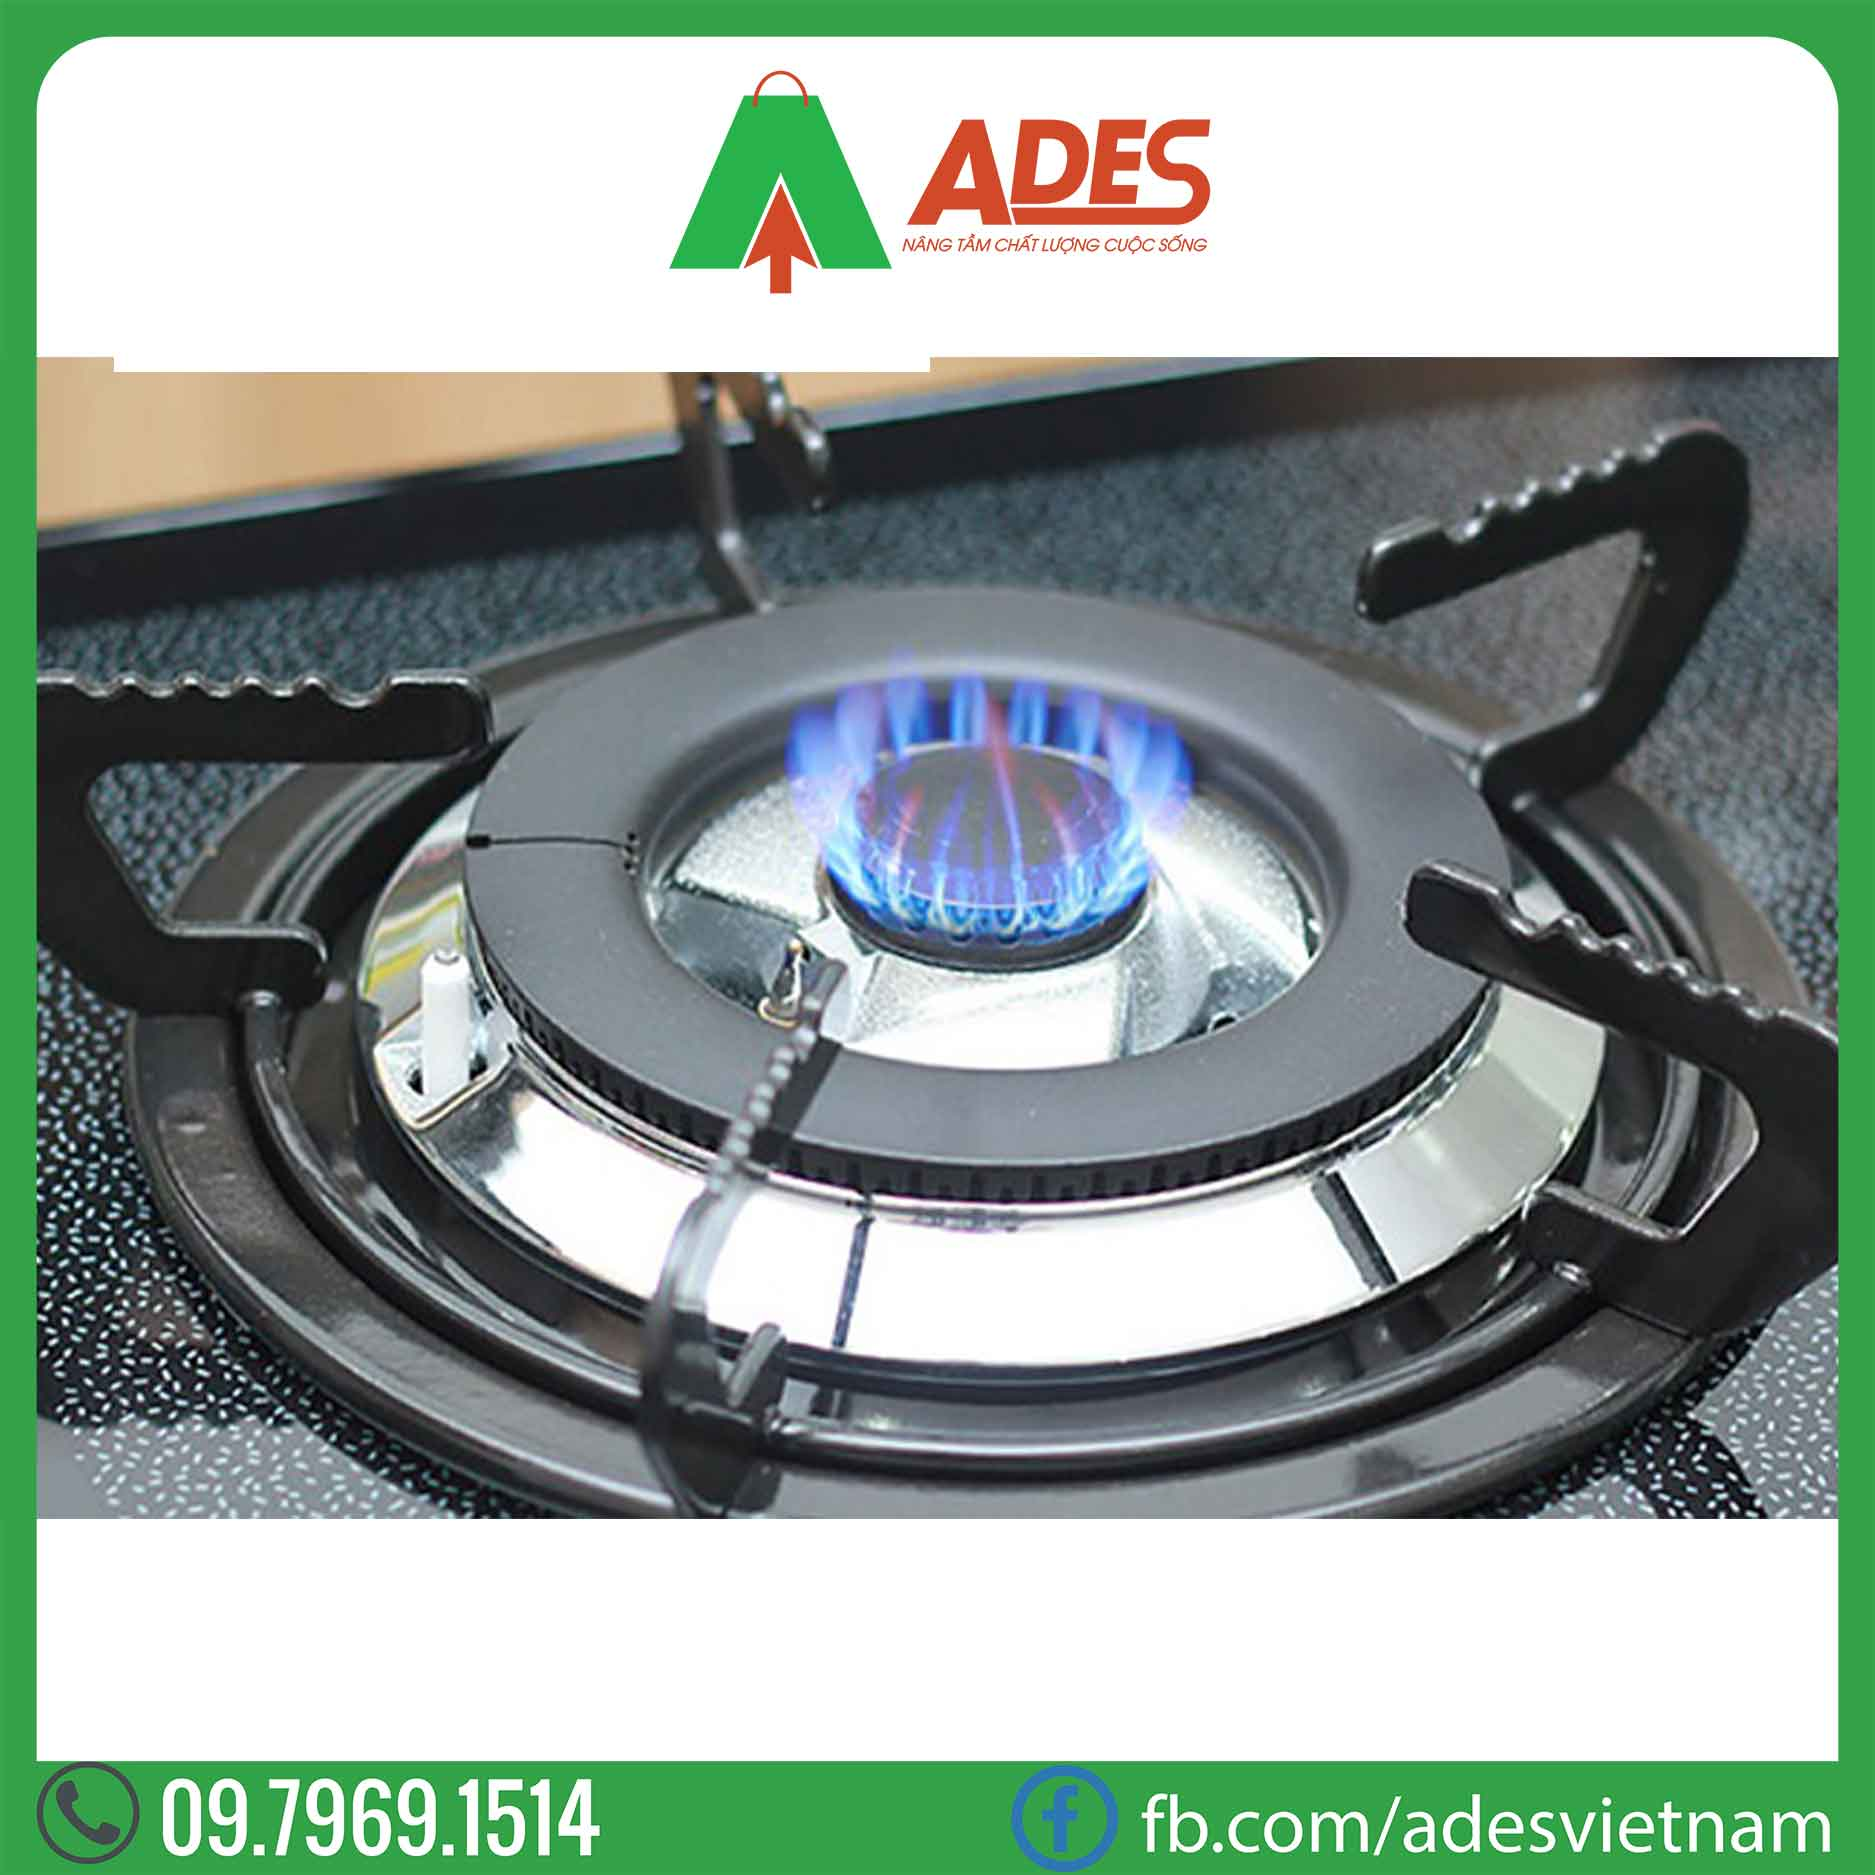 Bep gas am RinnaiRVB-2BG(Wv-M)N